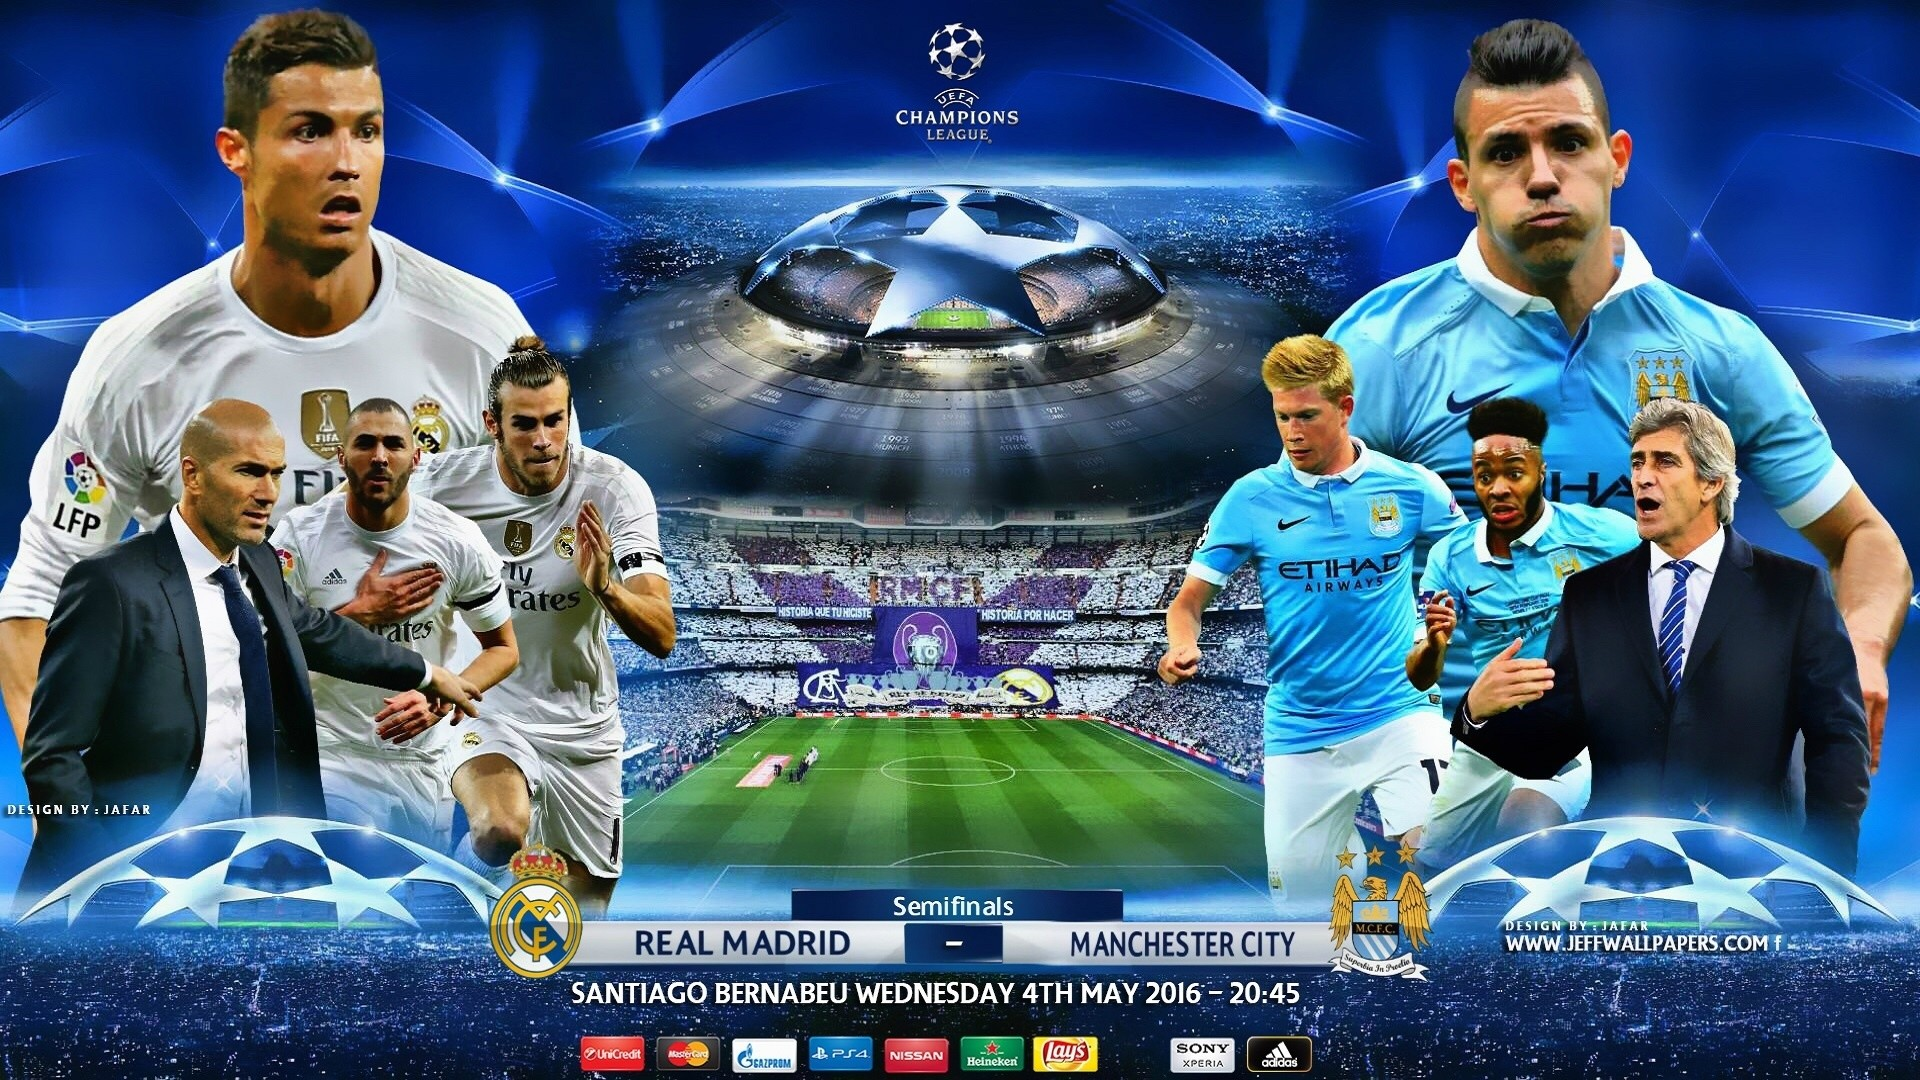 Barcelona Vs Man City Logo: Uefa Champions League Wallpaper HD (72+ Images